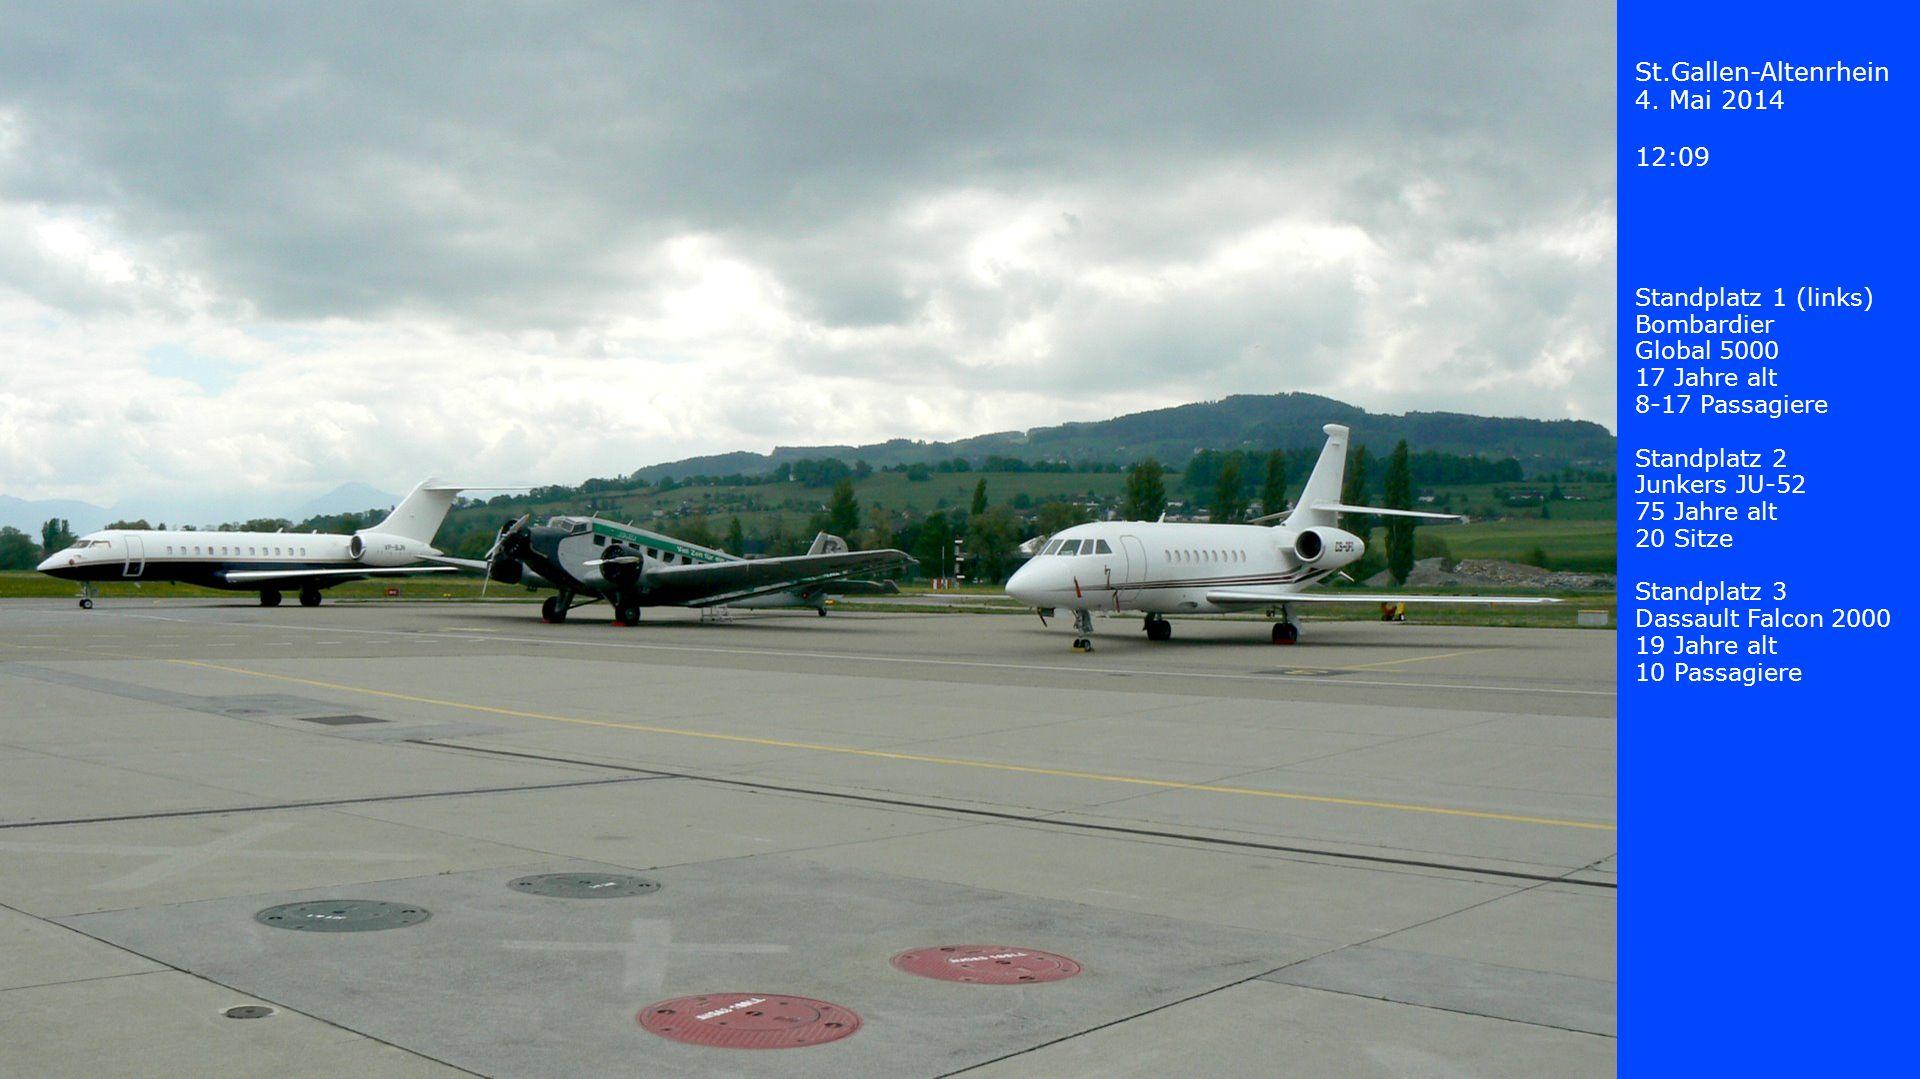 St.Gallen-Altenrhein 4. Mai 2014 12:09 Standplatz 1 (links) Bombardier Global 5000 17 Jahre alt 8-17 Passagiere Standplatz 2 Junkers JU-52 75 Jahre al